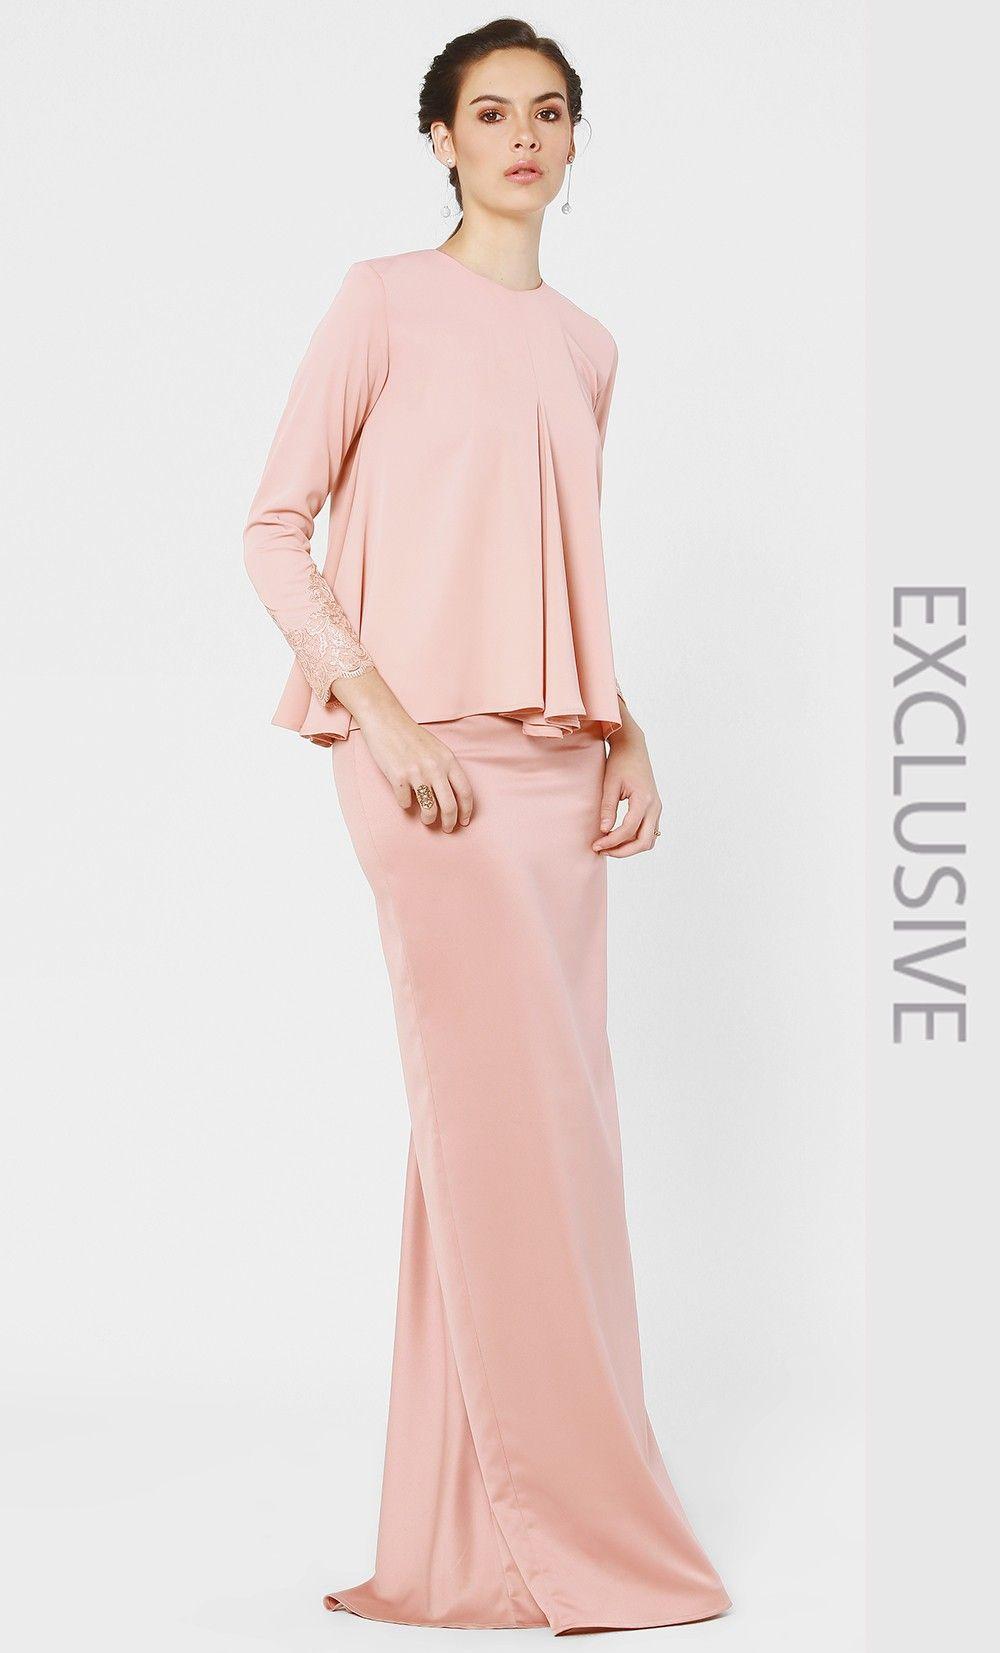 Pin by iffah k on raya inspiration pinterest dusty pink dahlia